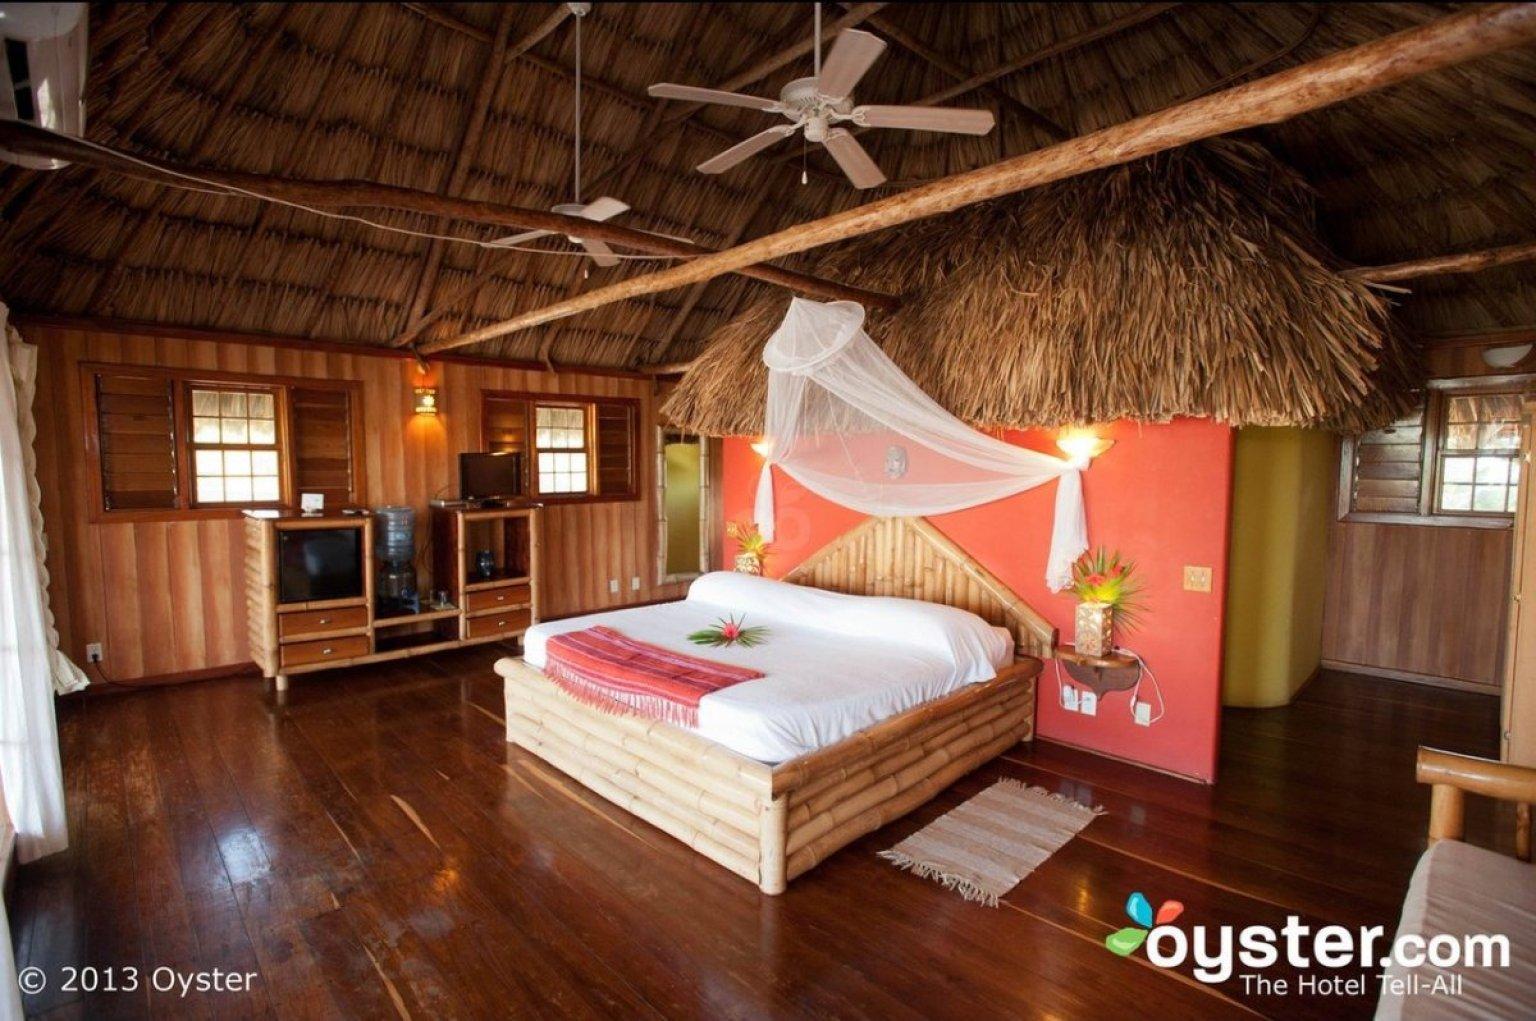 wonderful tree house hotel intended decor - miaowan.co